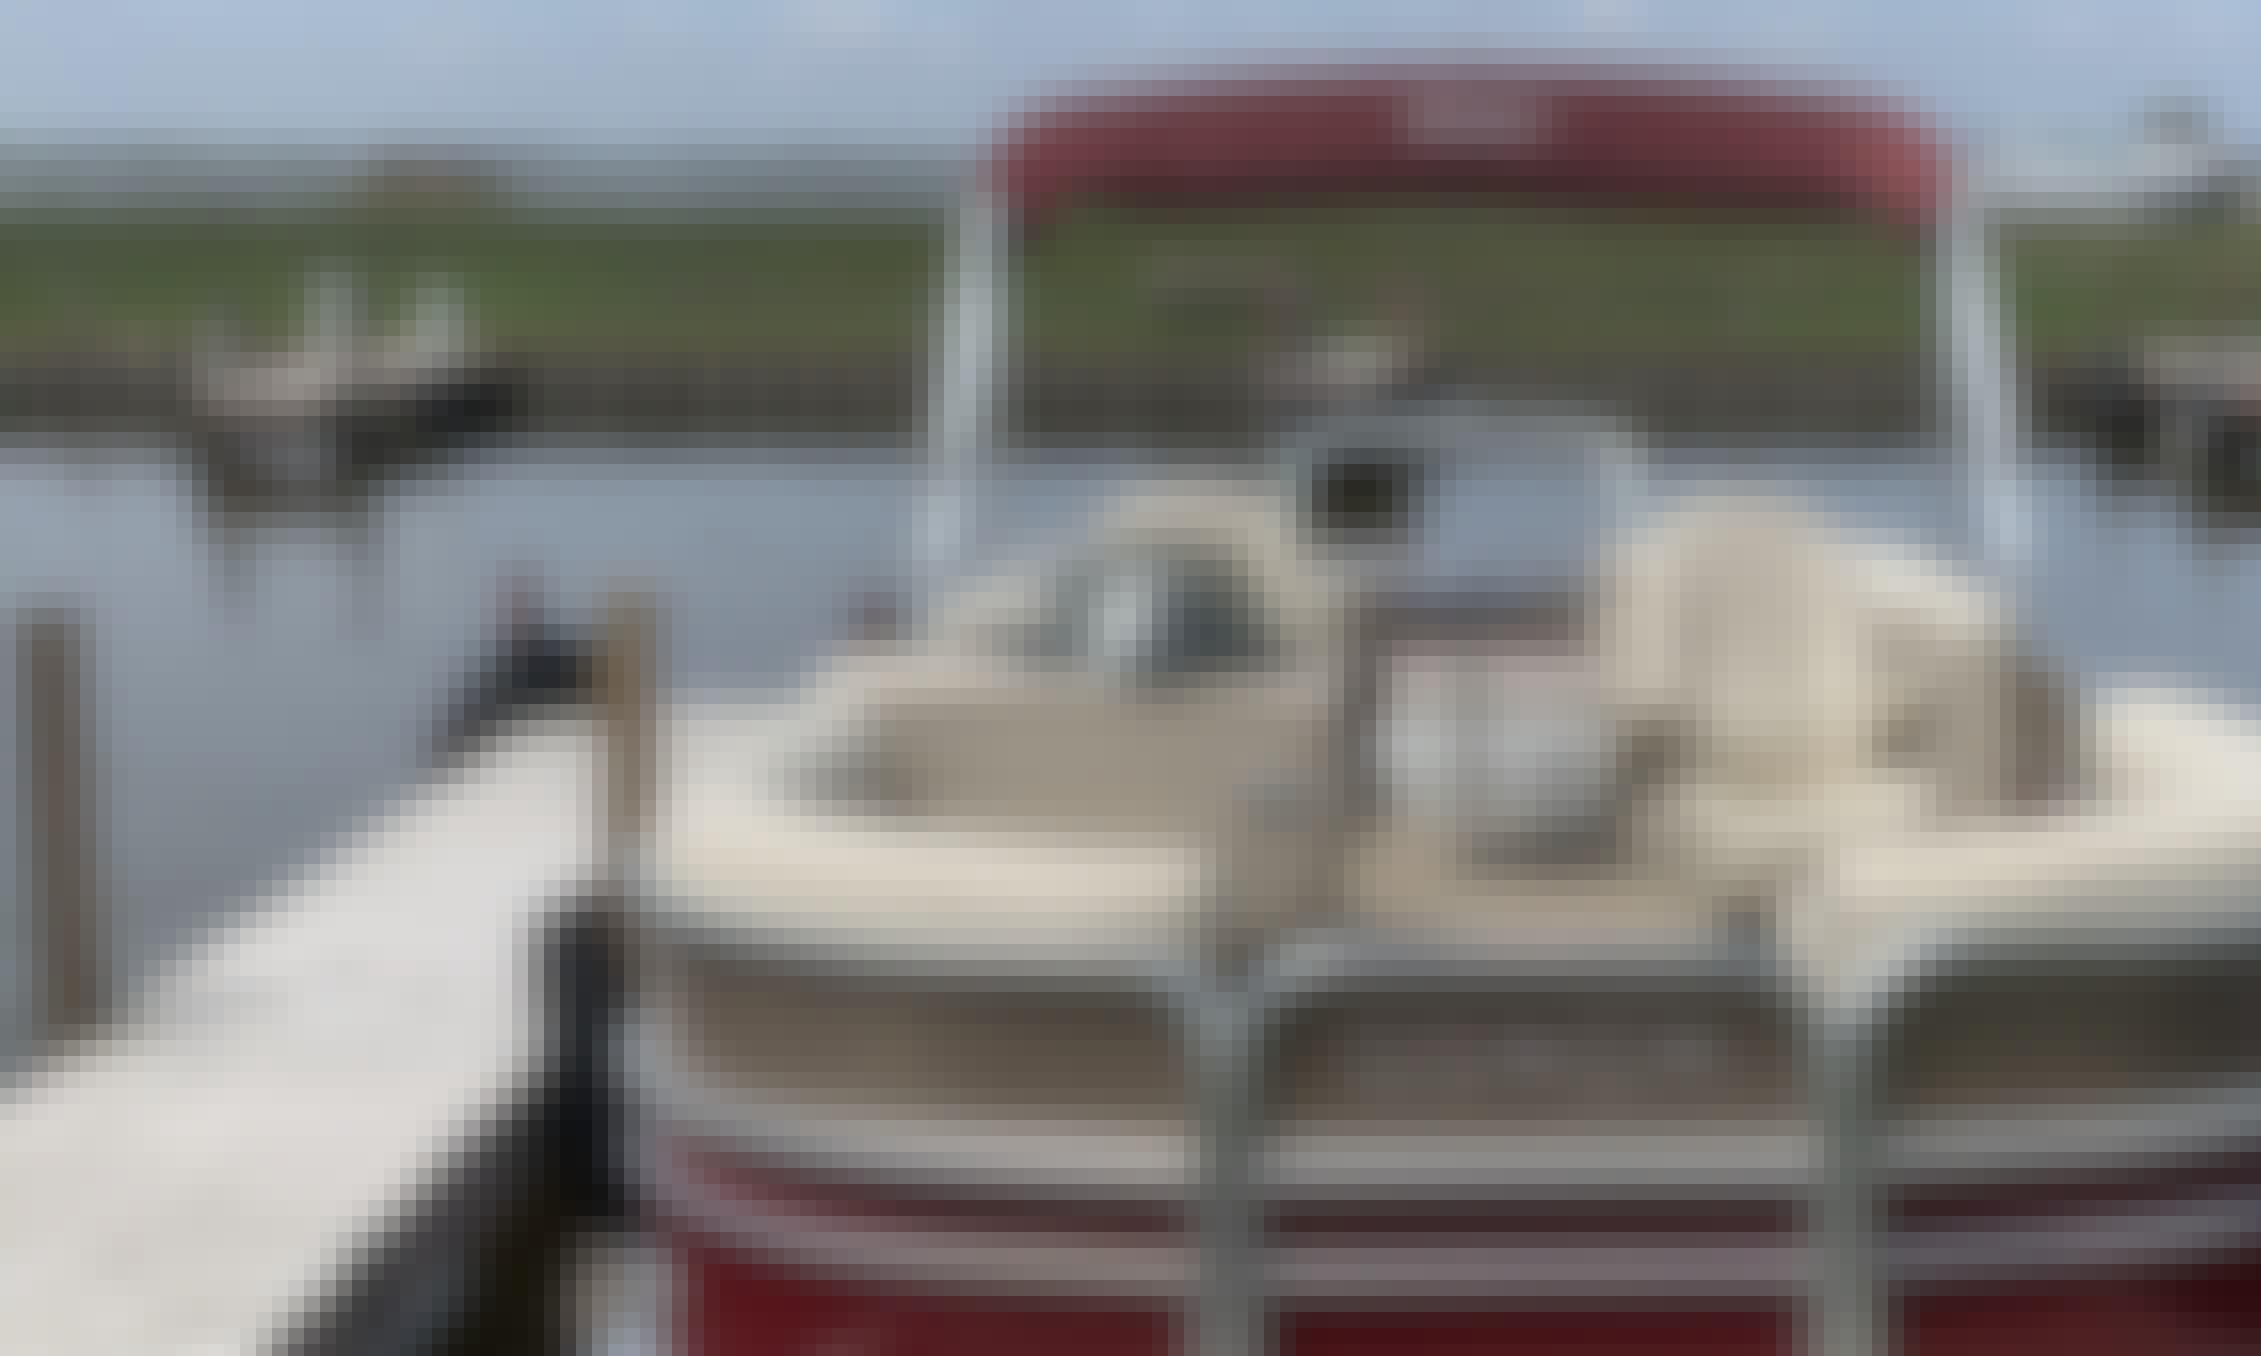 2018 Coach RF23 Pontoon!! Chain of the Lakes cruising!